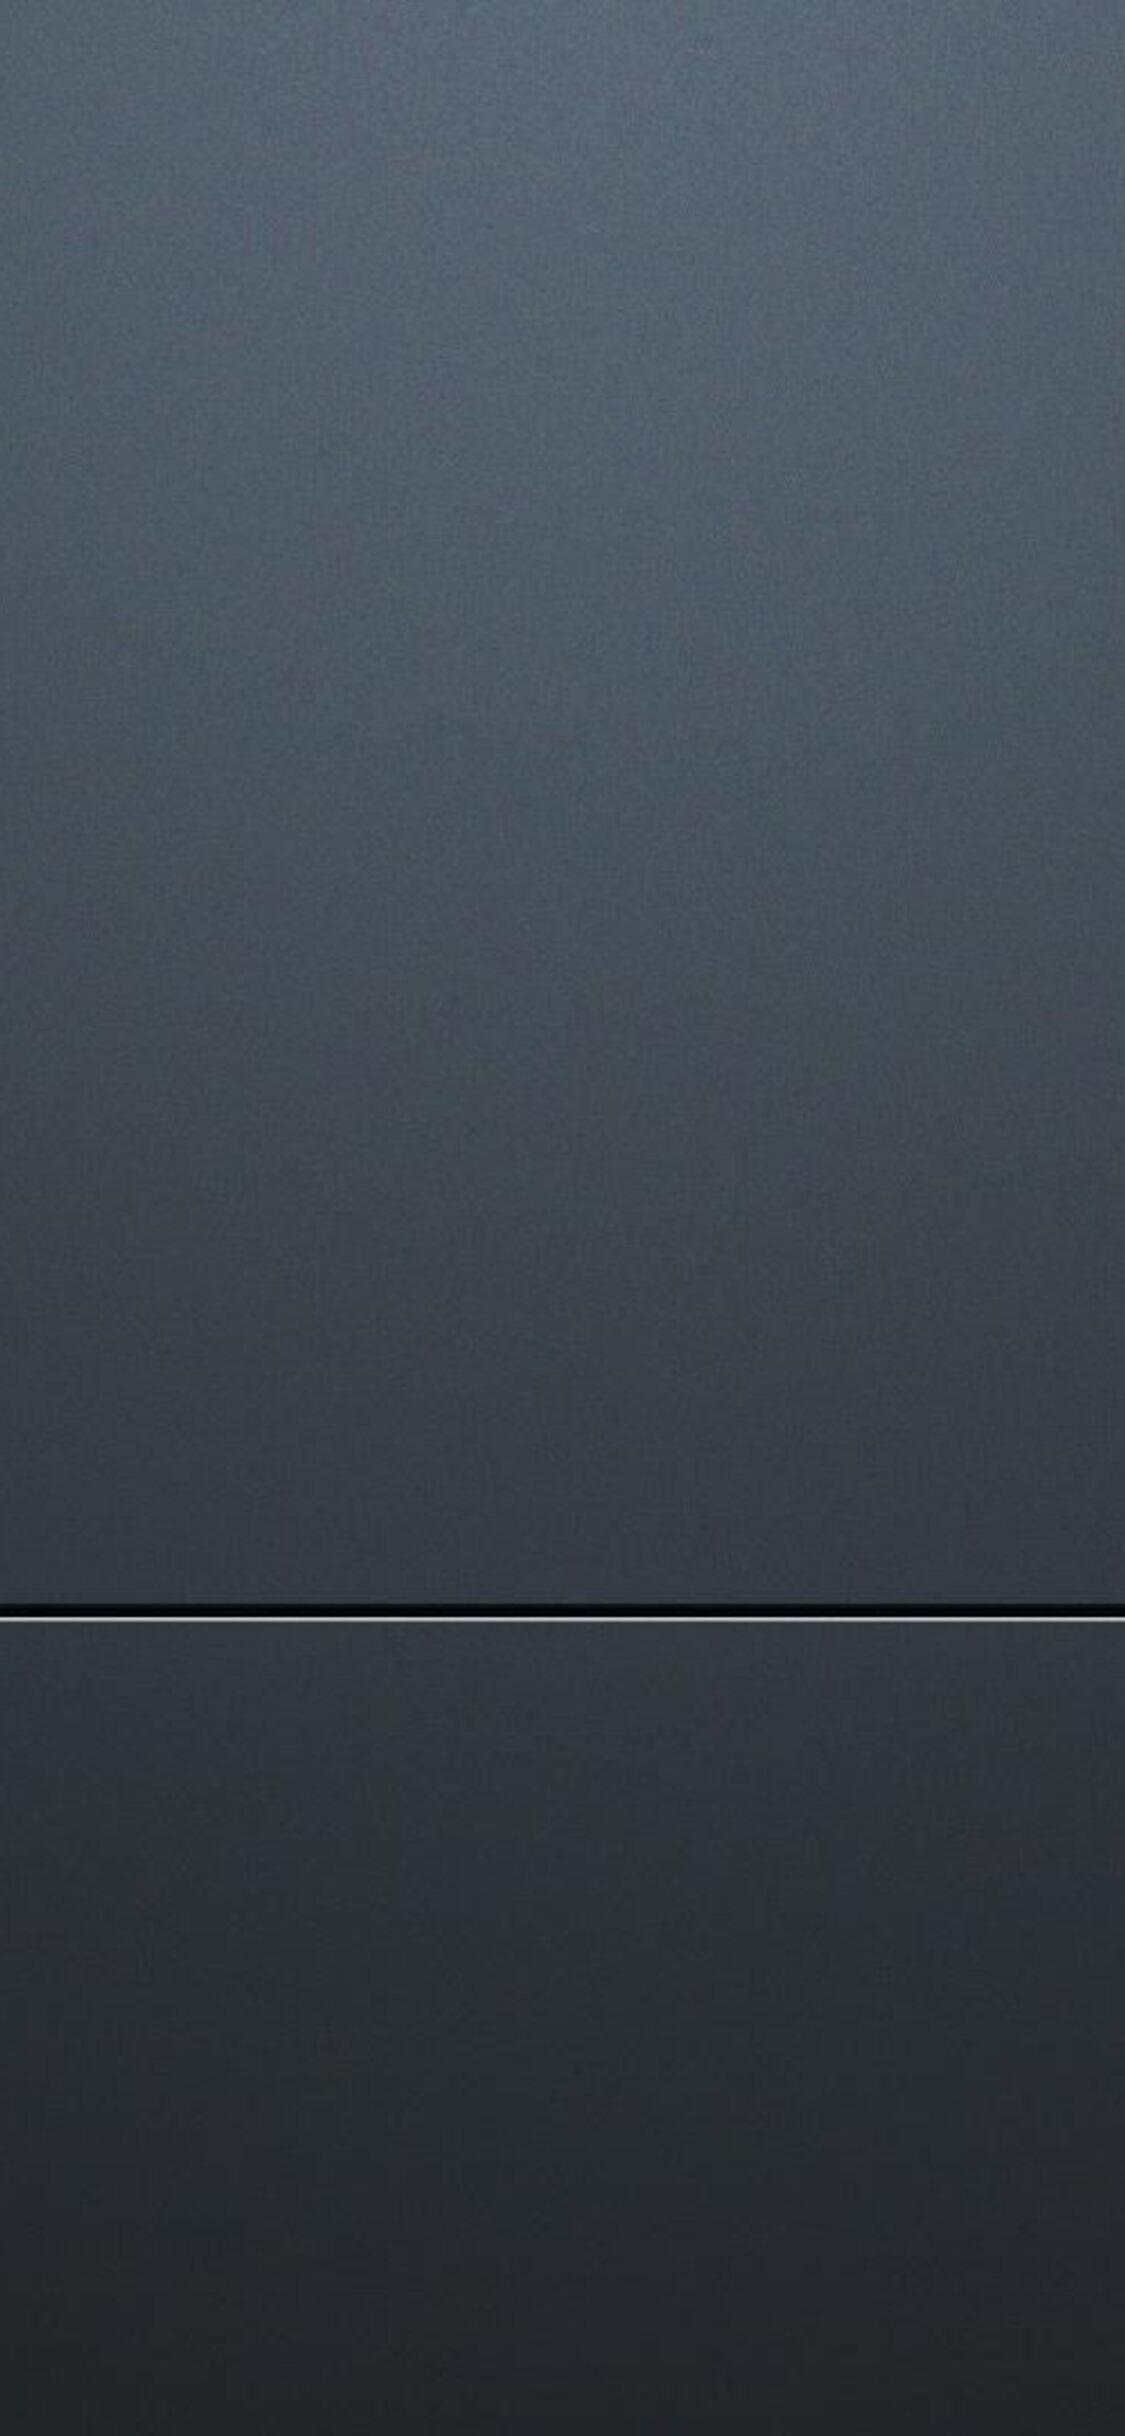 1125x2436 Gray Minimalism Iphone Xs Iphone 10 Iphone X Hd 4k